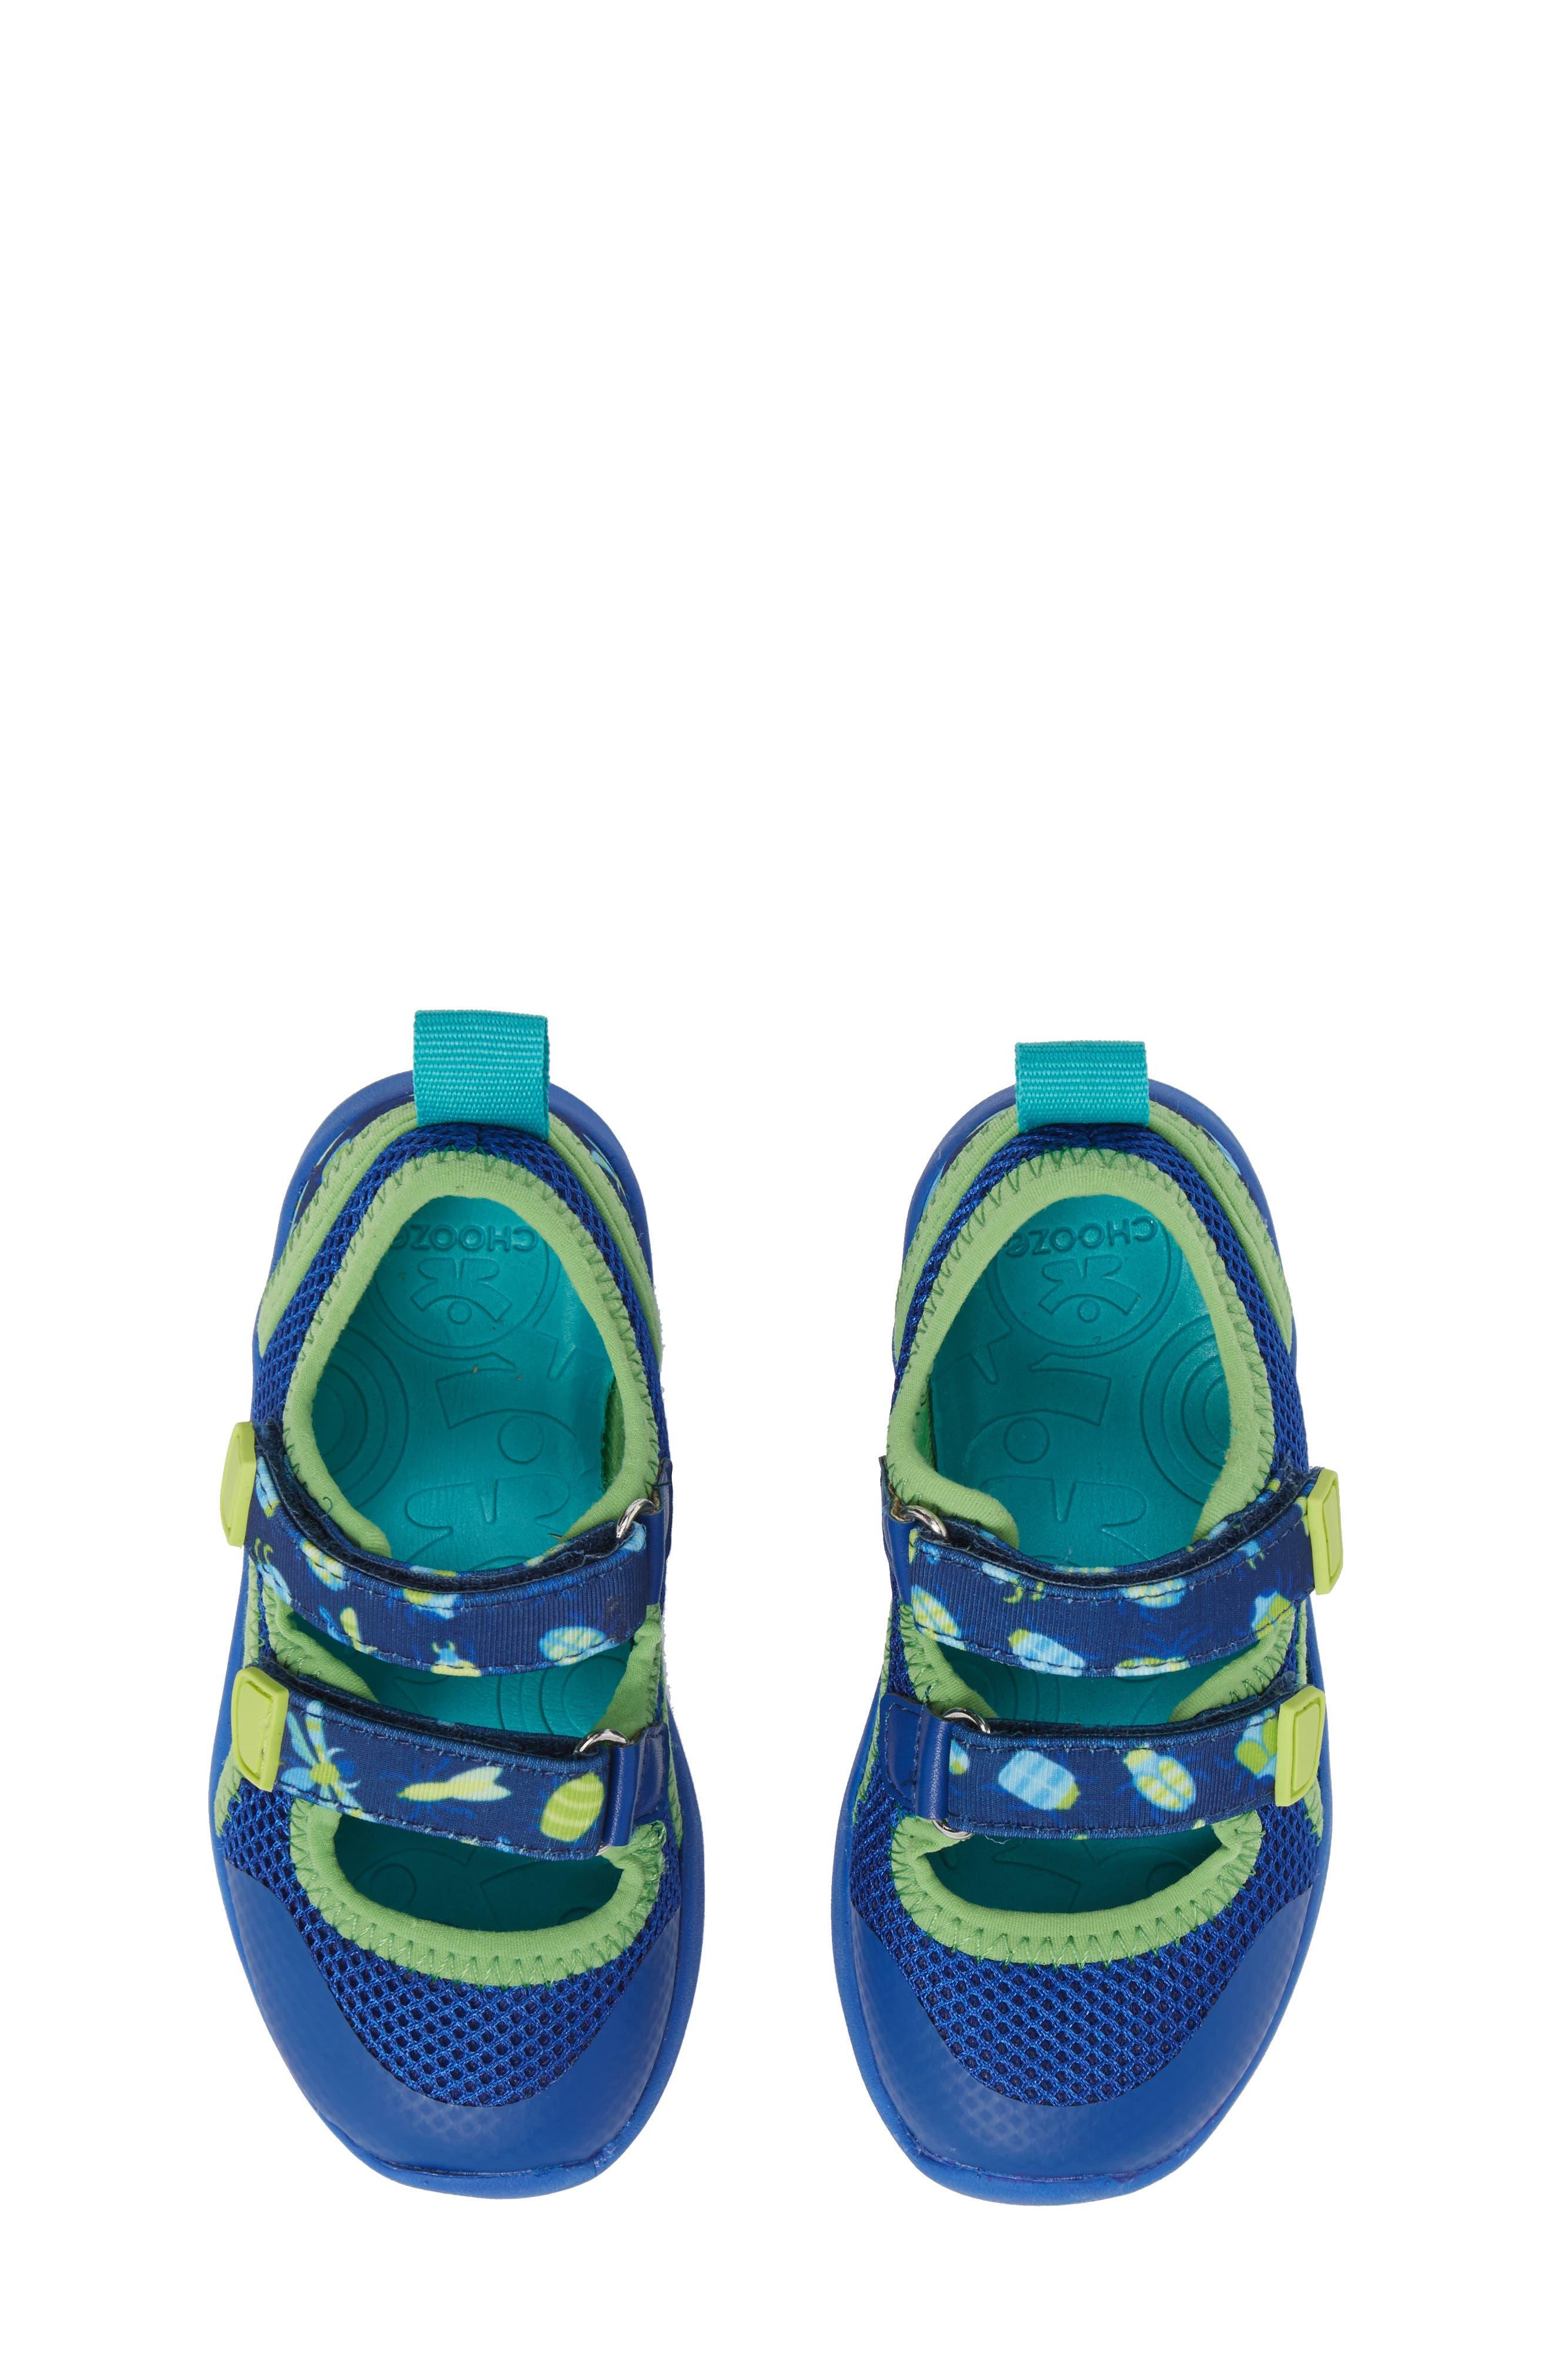 Sneak Water Friendly Sandal,                             Alternate thumbnail 5, color,                             Crawl